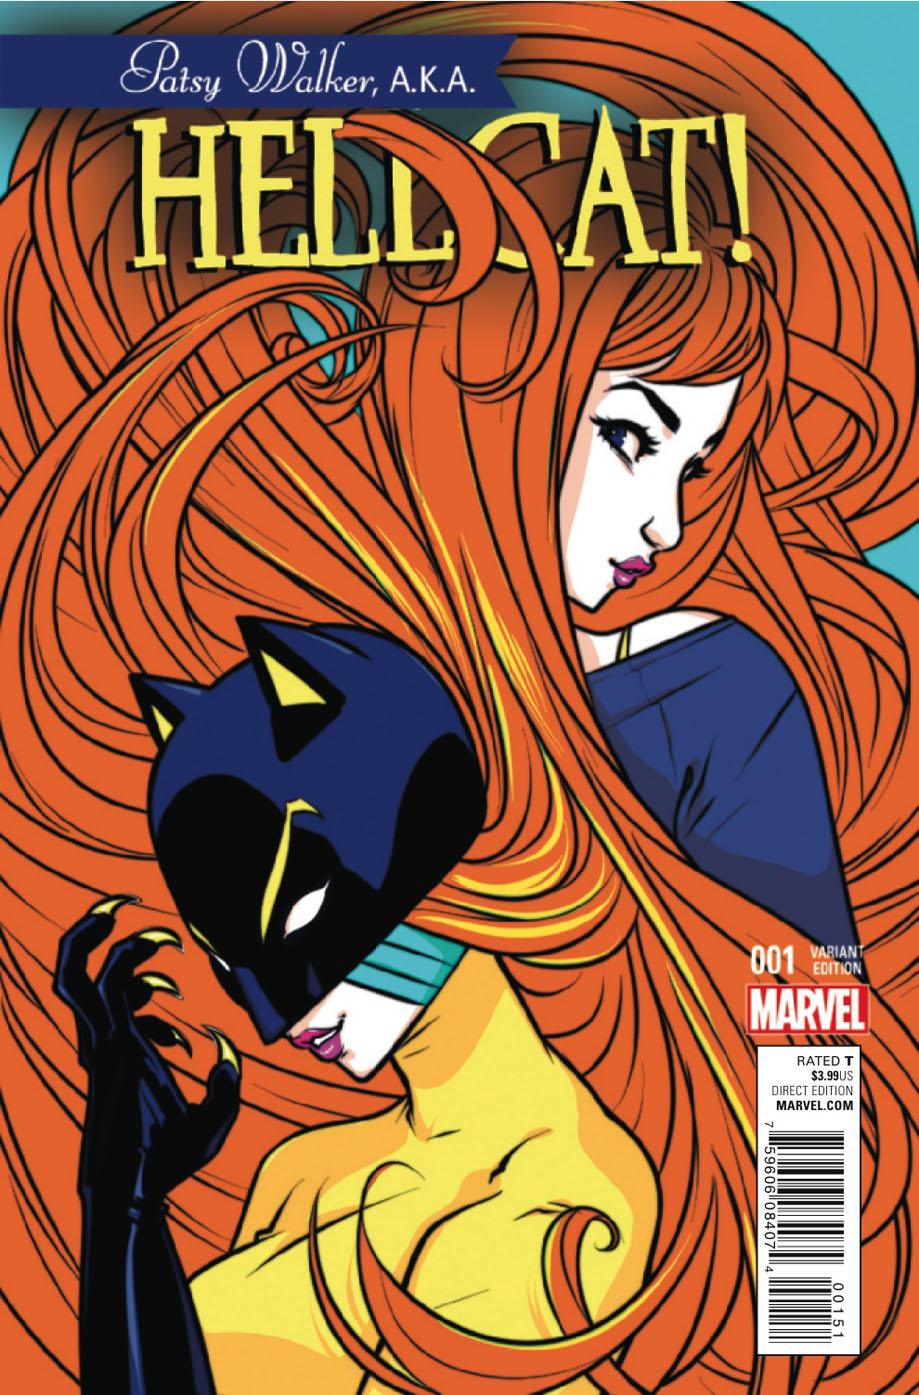 TORONTO CAT WOMAN: Patsy Walker, A.K.A. Hellcat